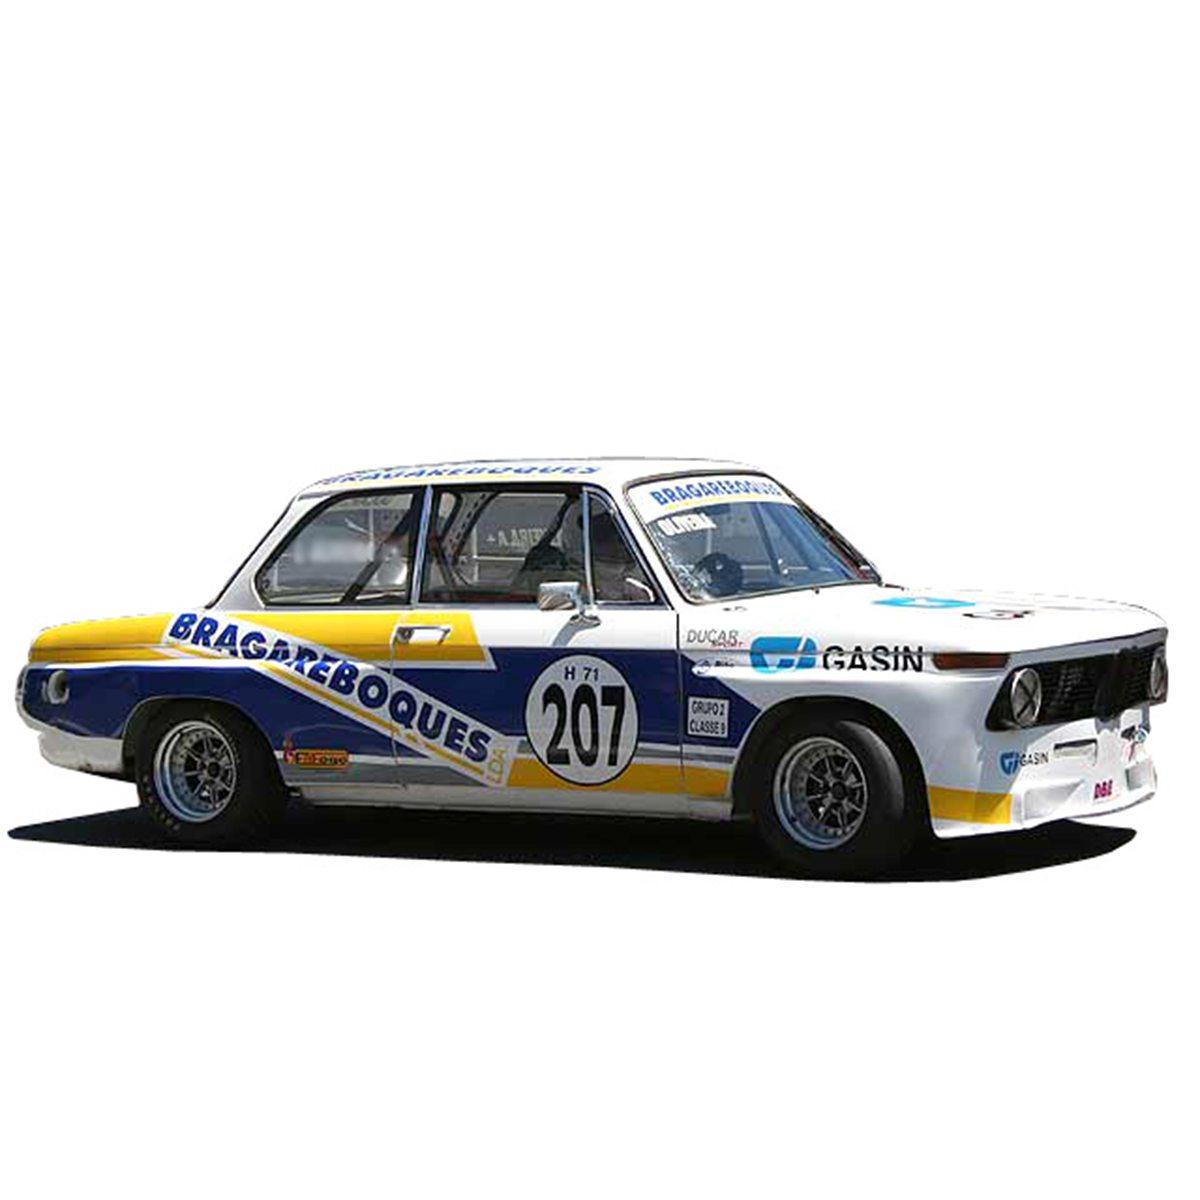 BMW-2002-Lado